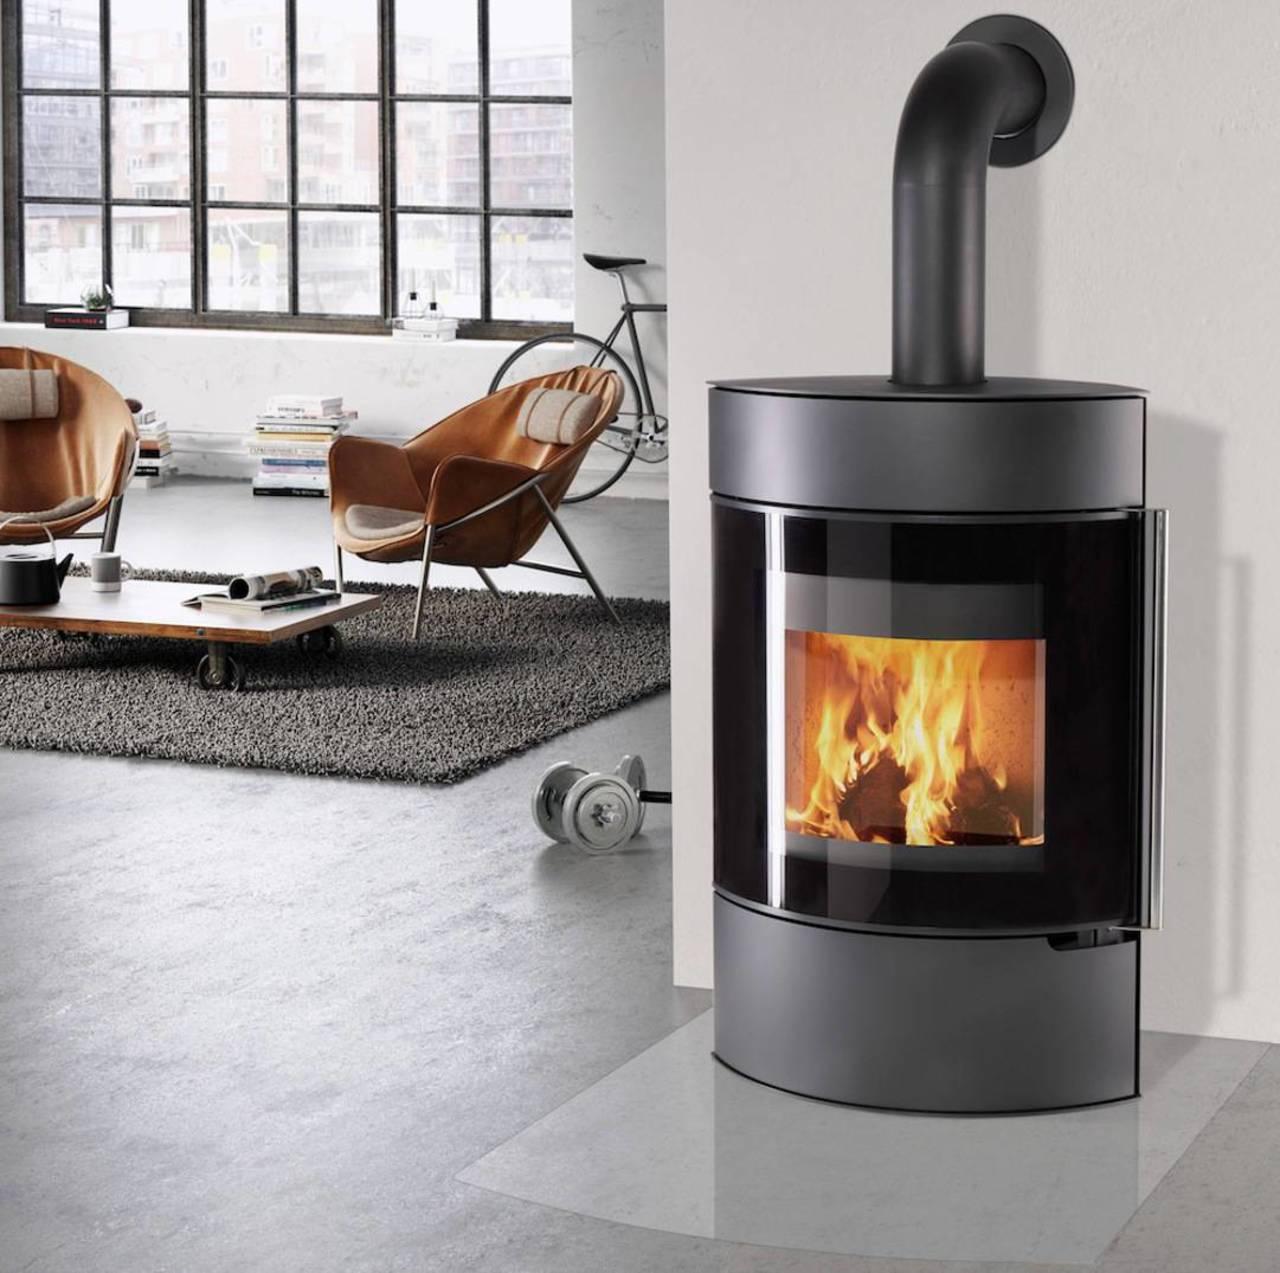 thermia kaminofen elipso xl stahl 8 kw vollglast r. Black Bedroom Furniture Sets. Home Design Ideas